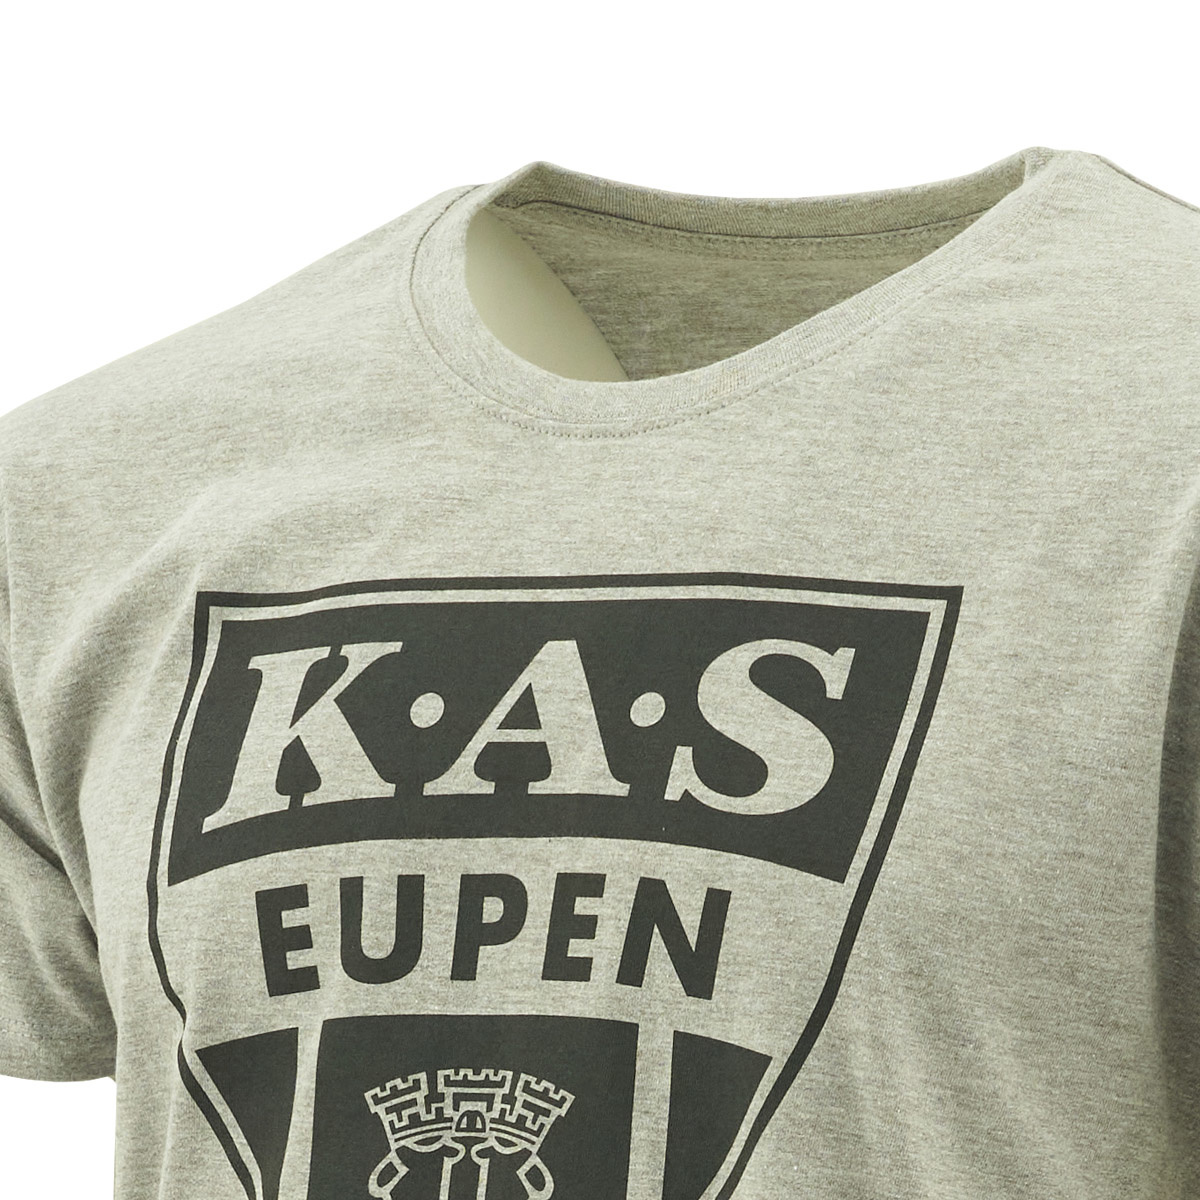 Topfanz T-shirt grau logo